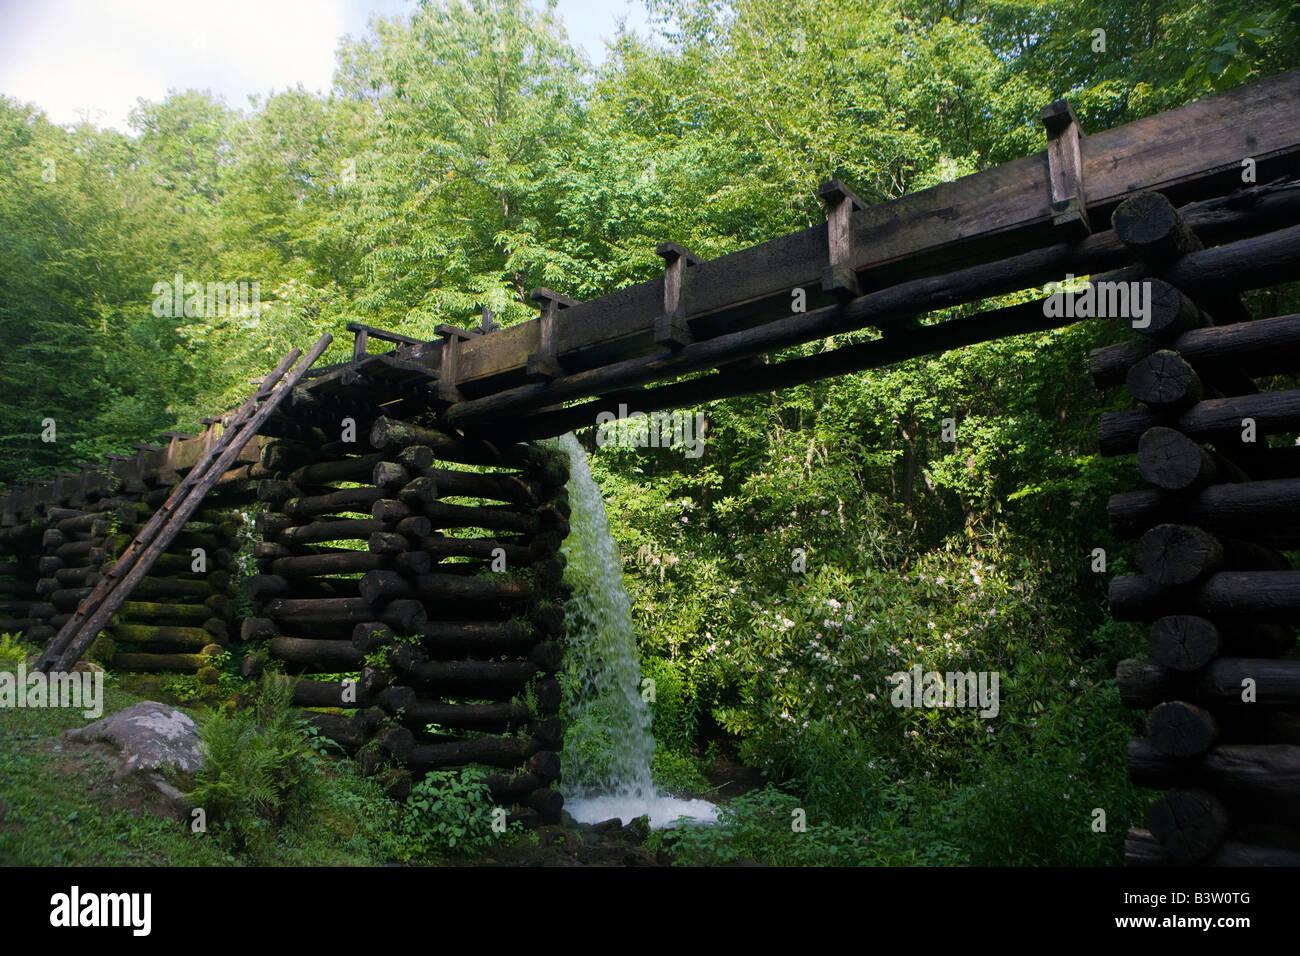 Mingus Mill, Great Smoky Mountains National Park, North Carolina, July 8, 2008 - Stock Image